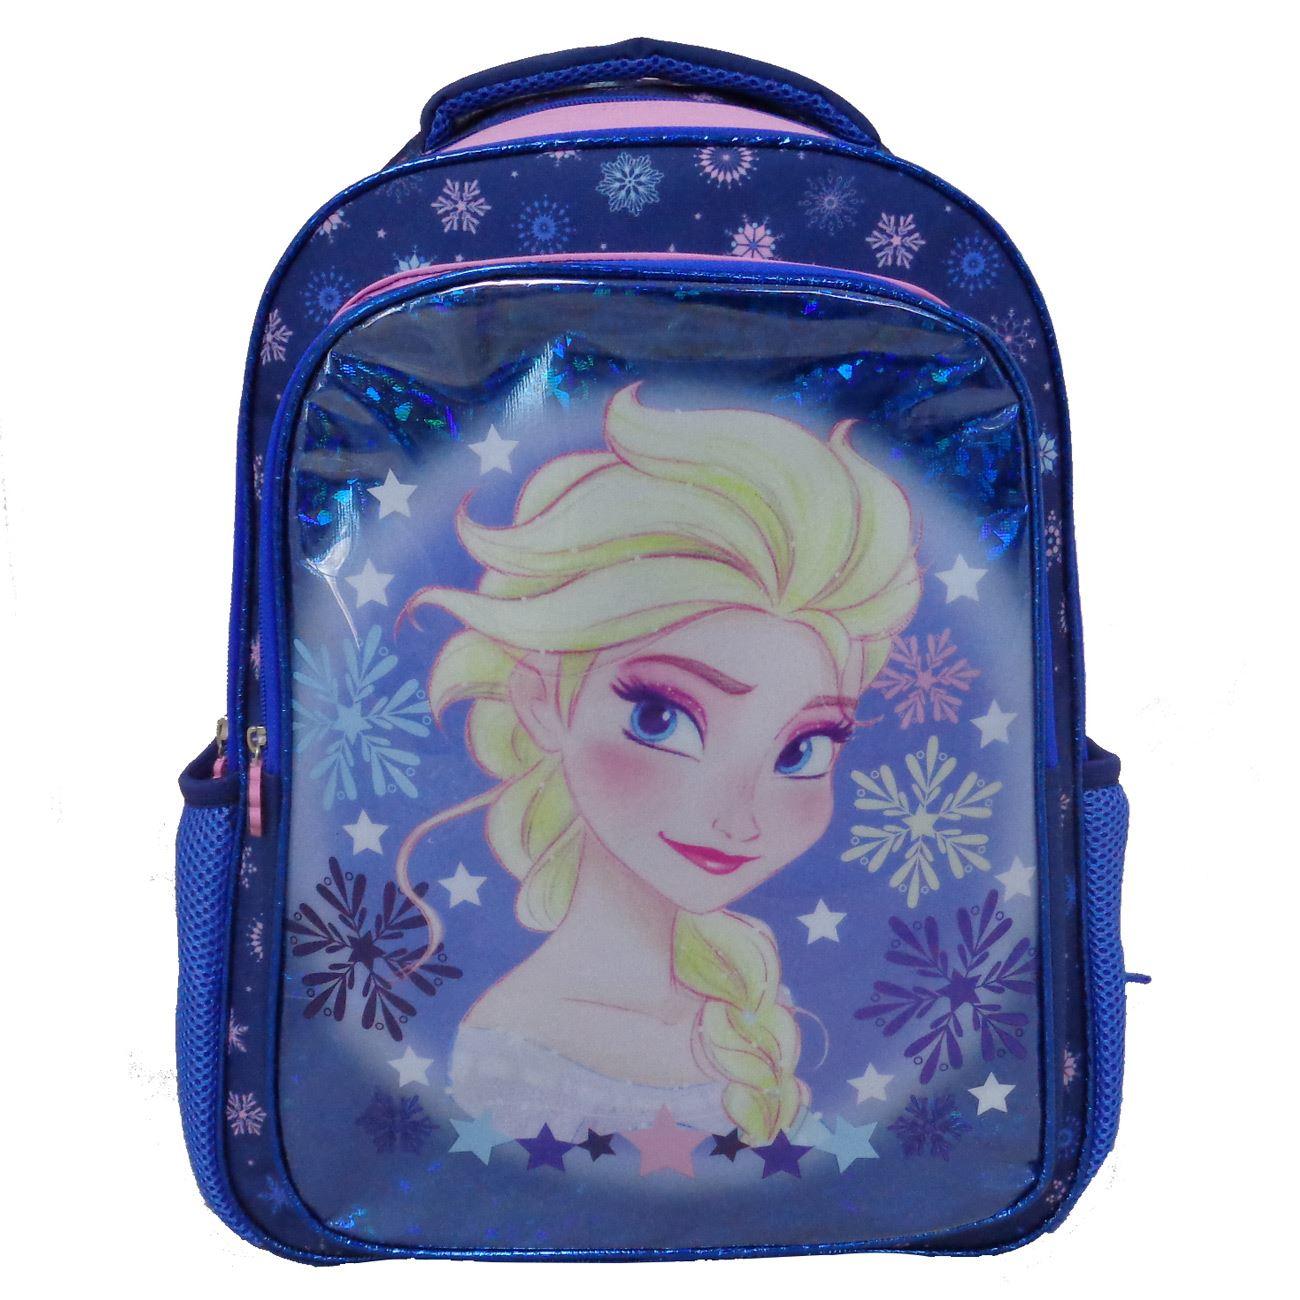 6ee82499ea2 Σχολική Τσάντα Δημοτικού FROZEN < Τσάντες Δημοτικού για Κορίτσια | Jumbo